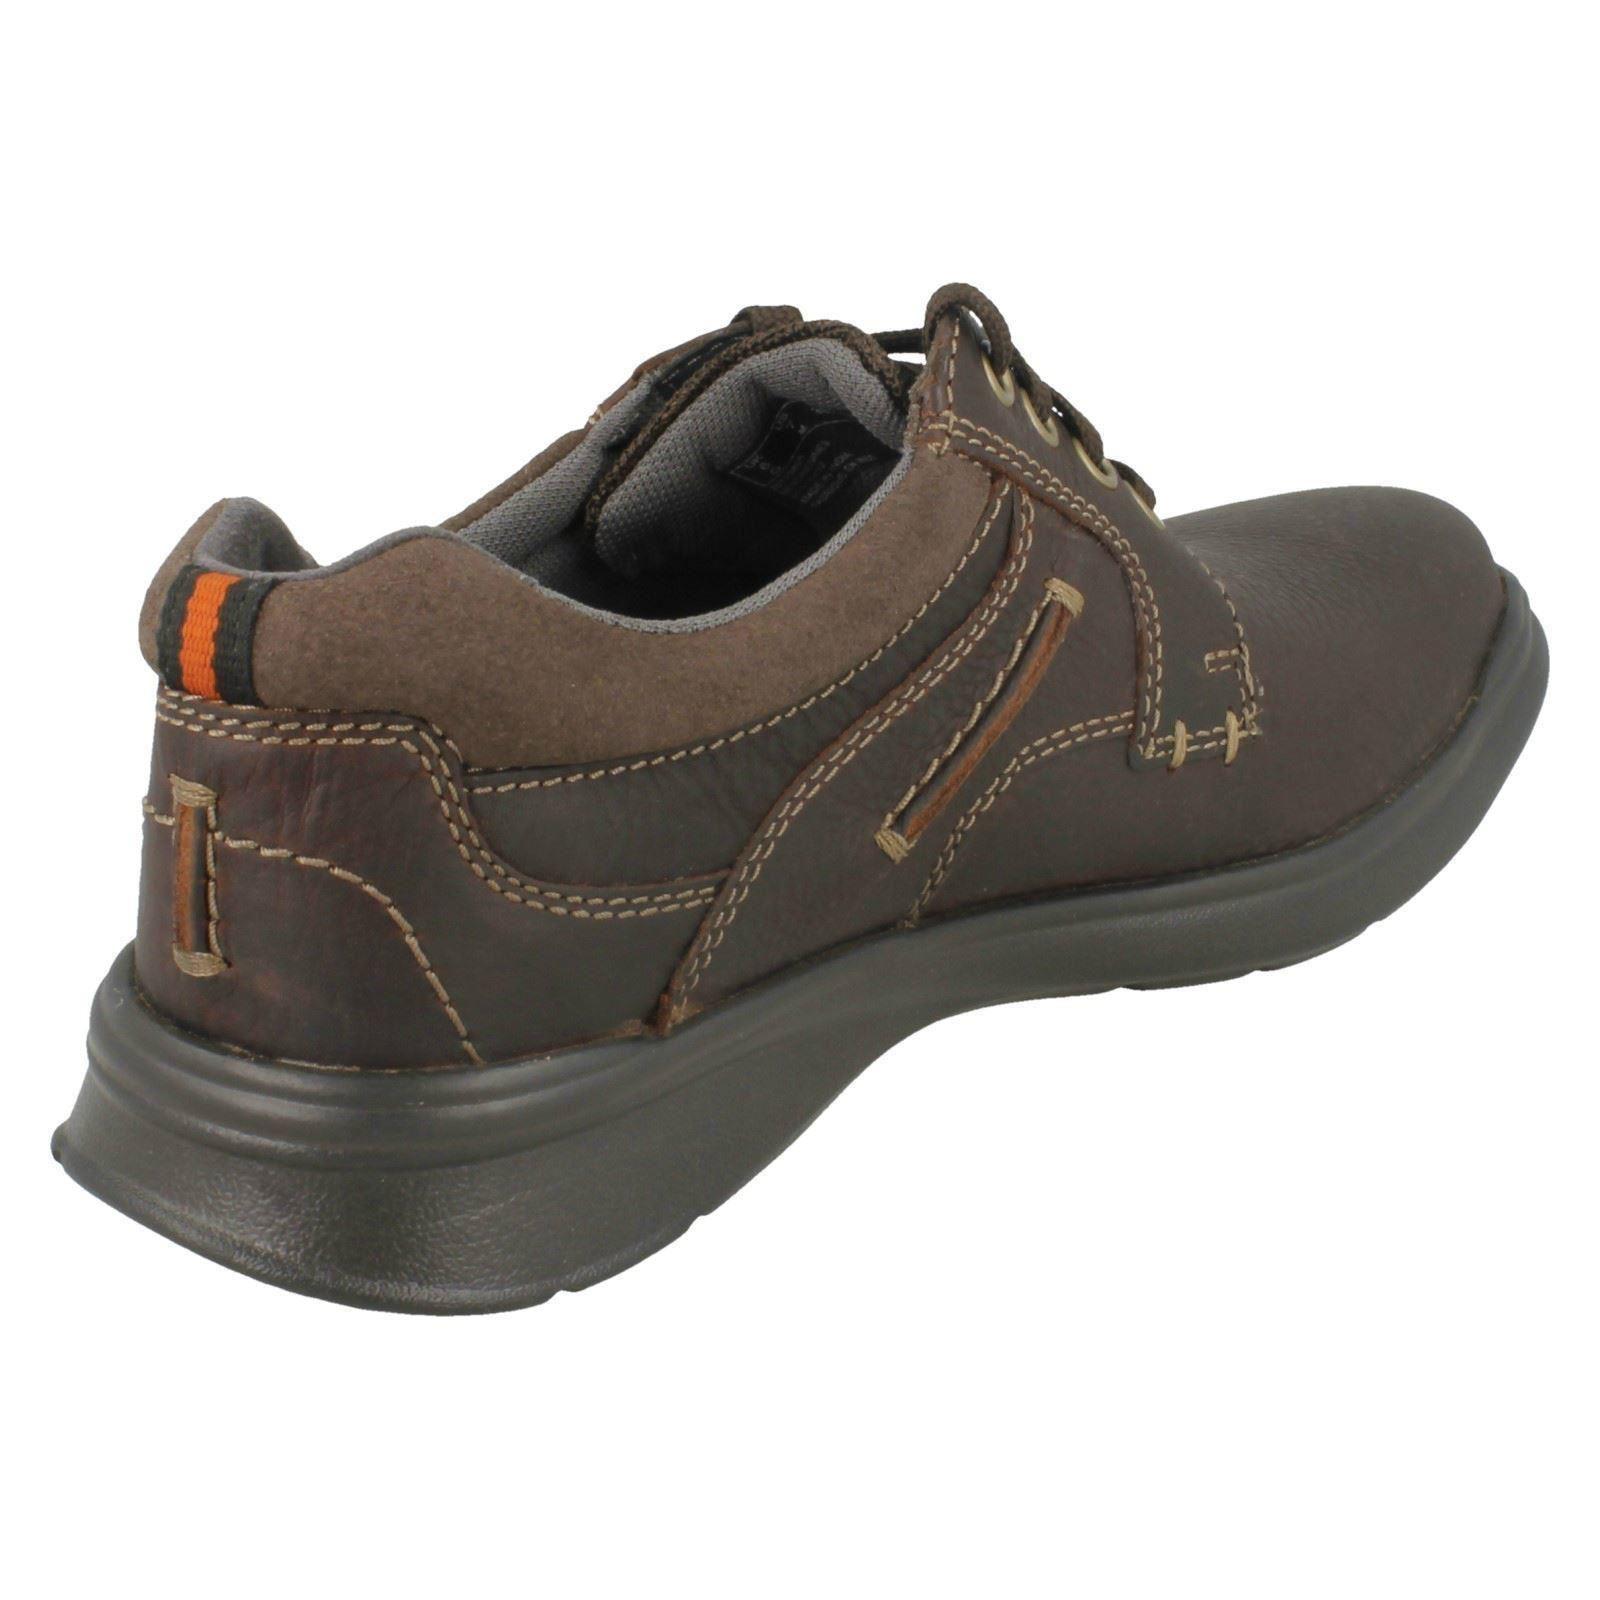 'Cotrell Herren Clarks Casual Schuhes 'Cotrell  Plain' fea973